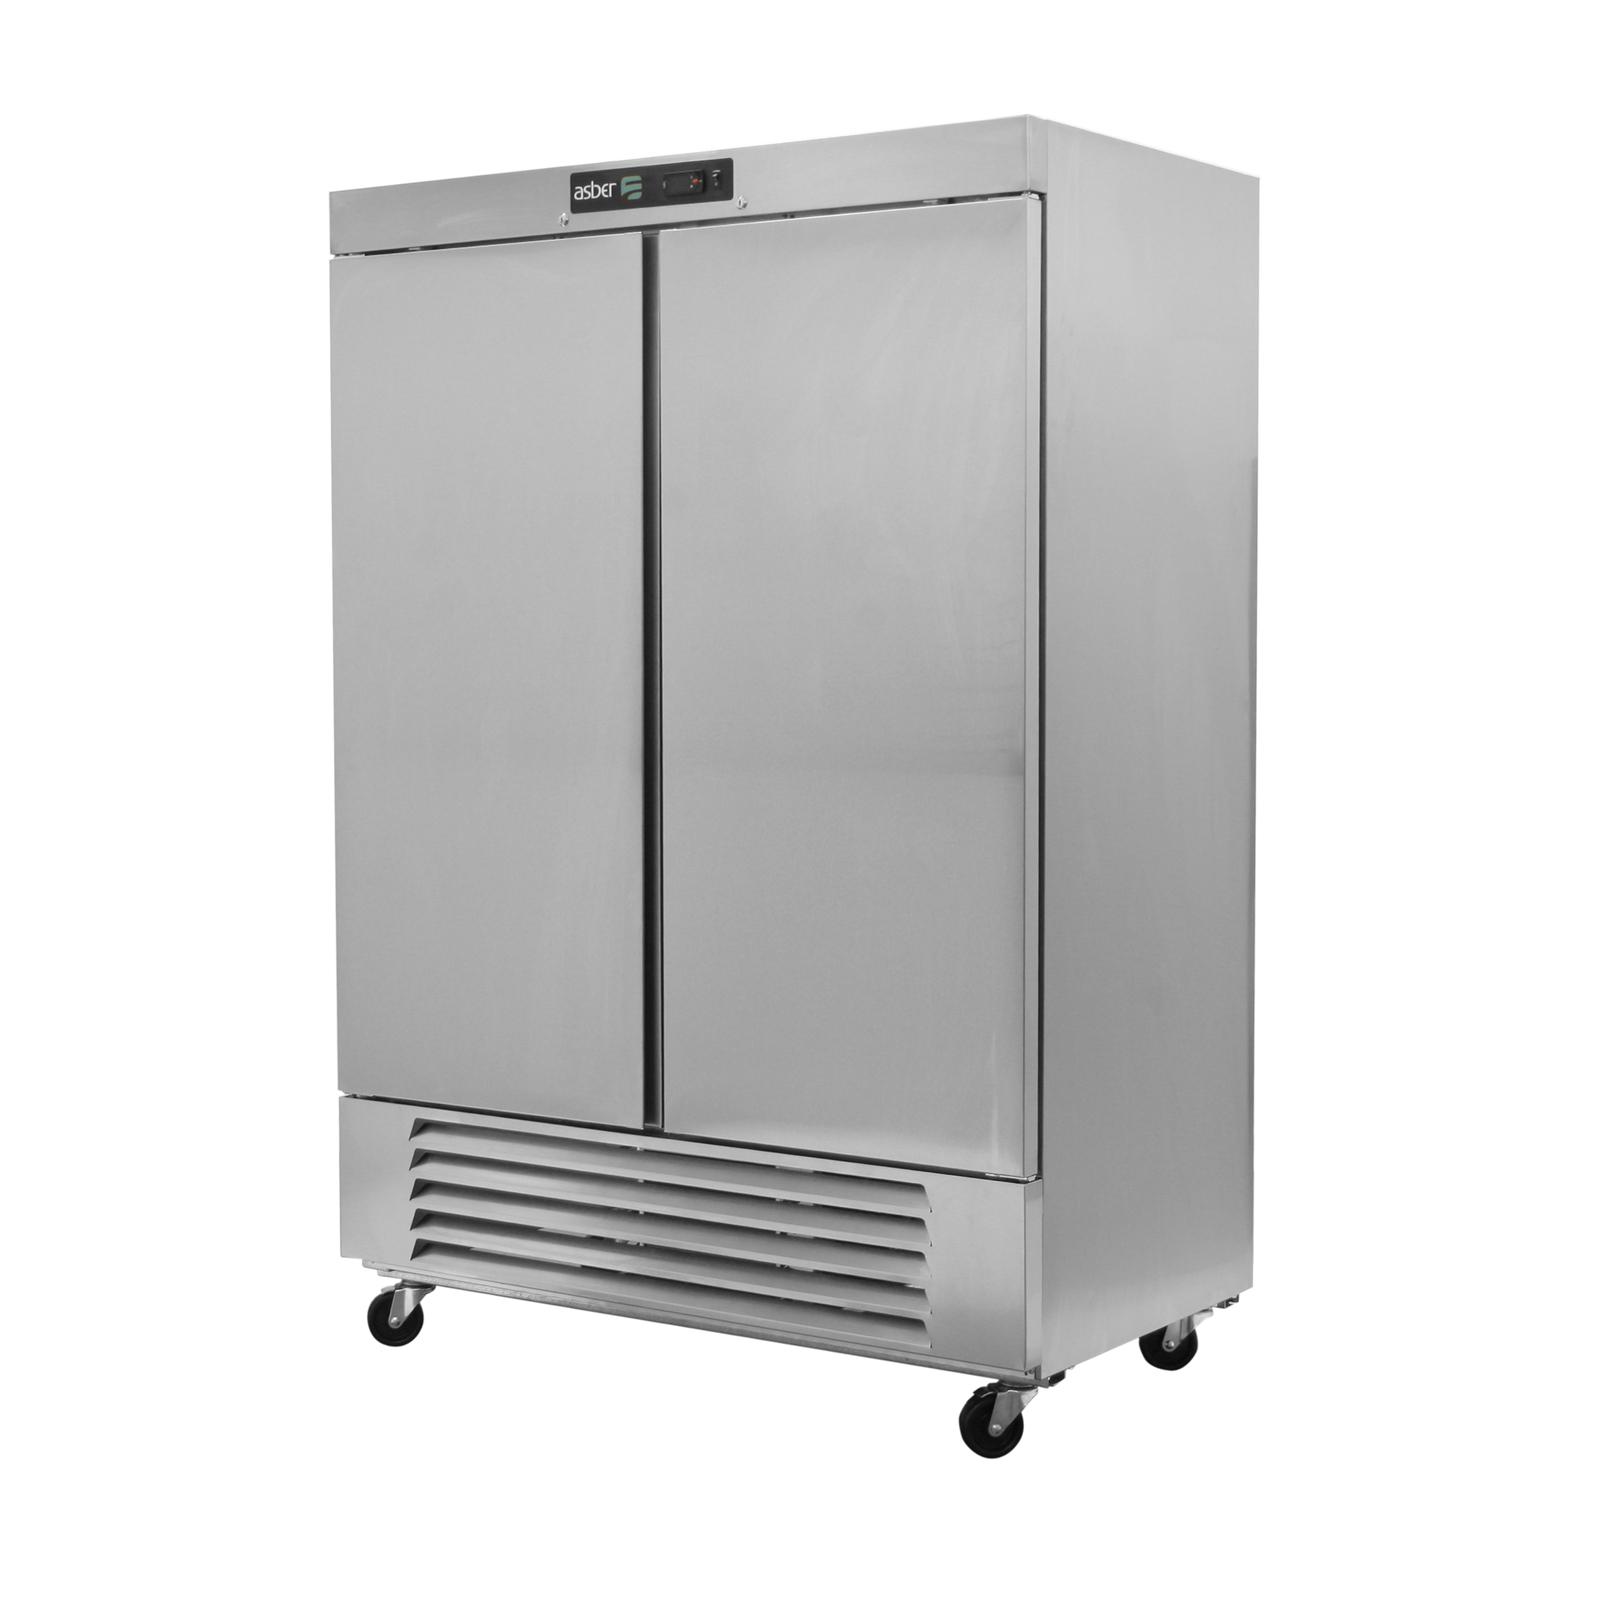 Asber ARR-49-H refrigerator, reach-in